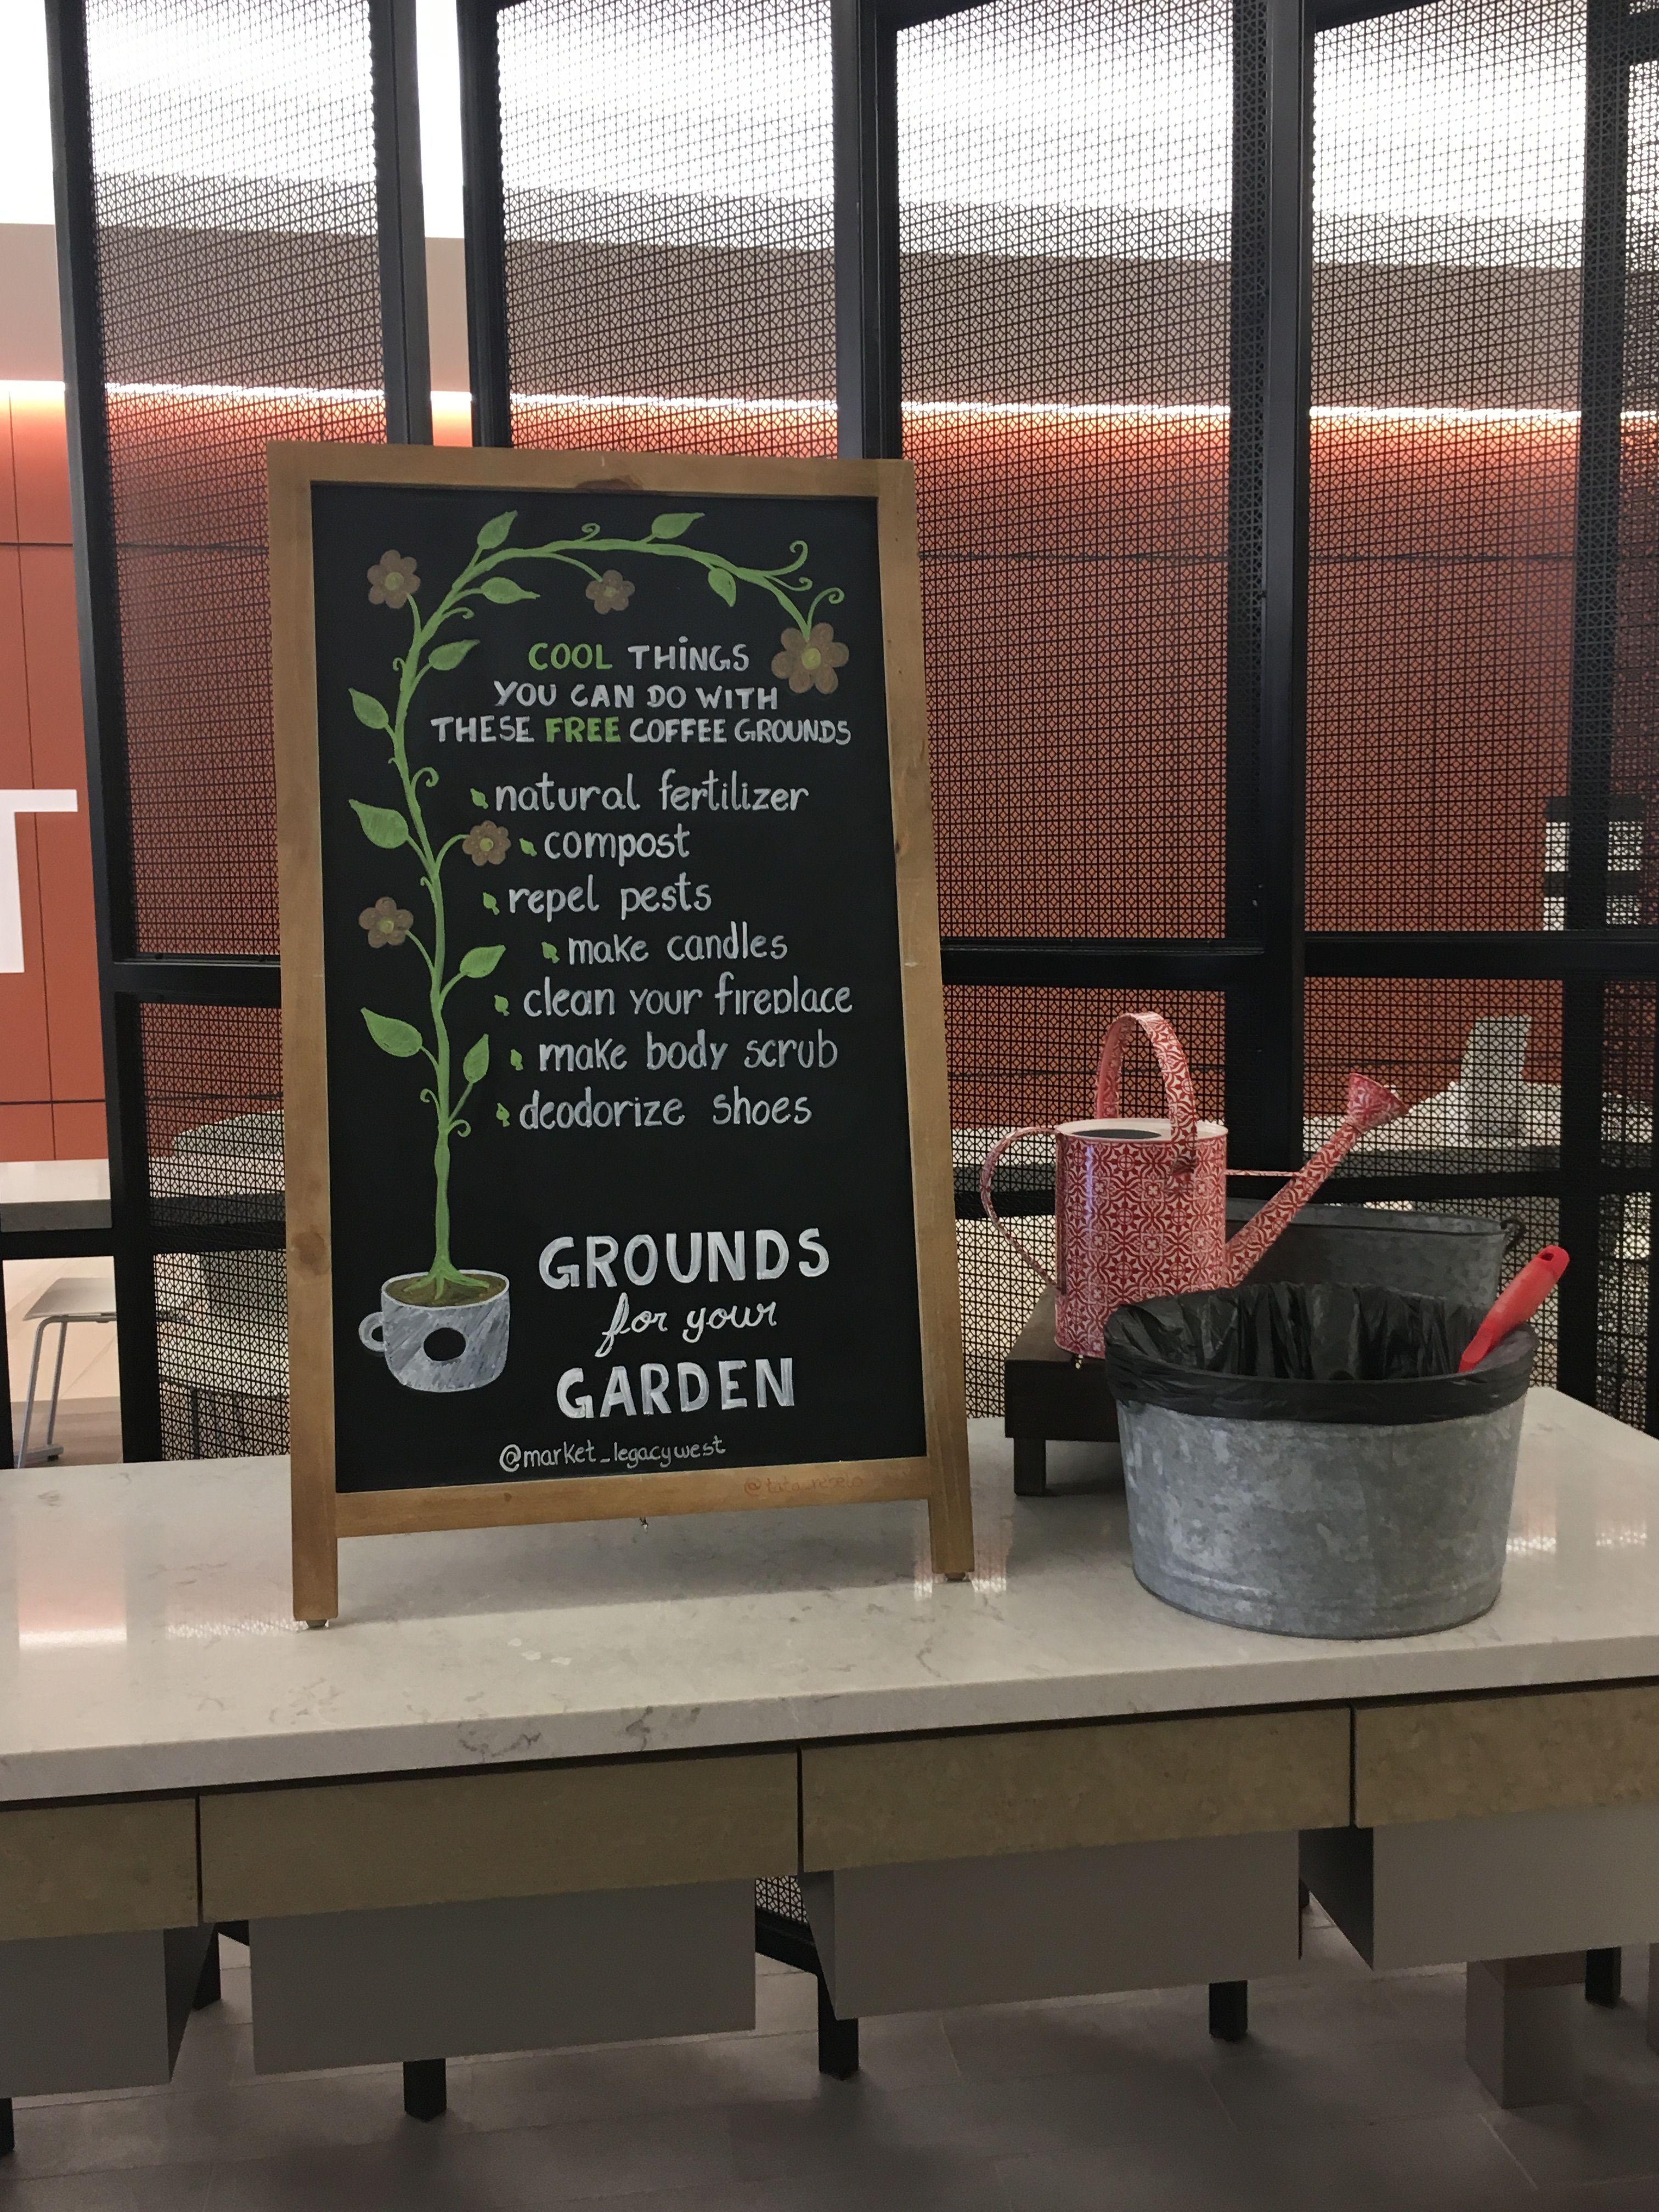 Chalkboard art Grounds for your garden Starbucks crafts